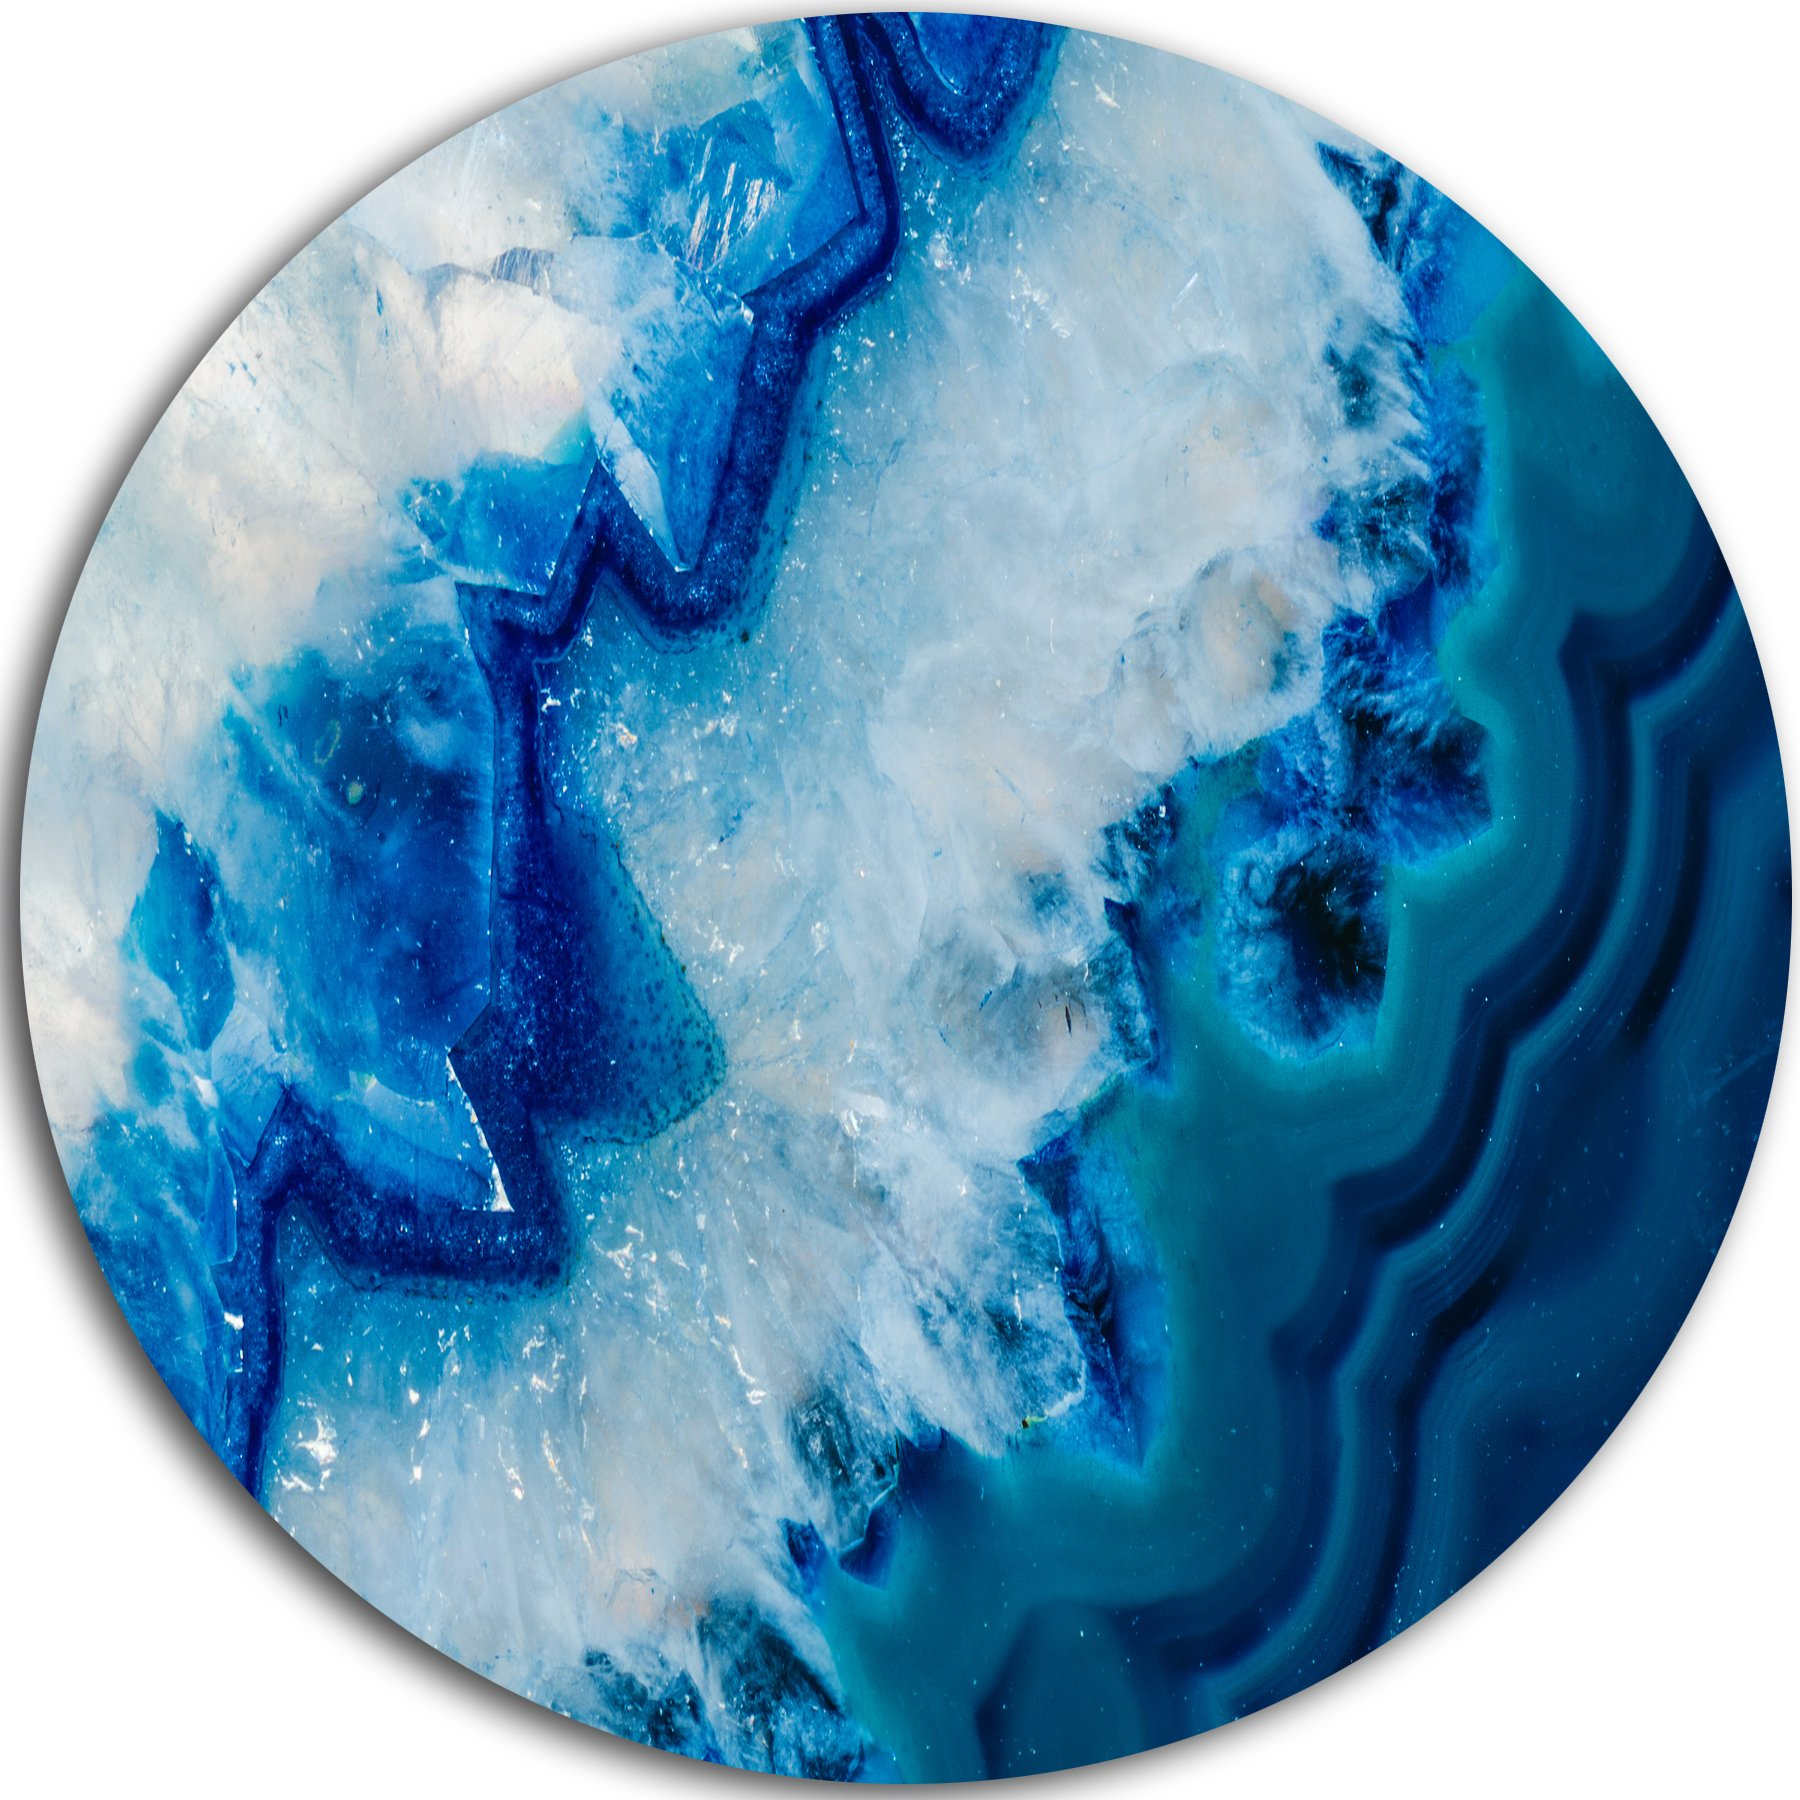 Designart MT8834-C38 ''Geode Slice Macro Abstract Digital Art Round'' Metal Wall Art, 38'' x 38'', Blue/White by Design Art